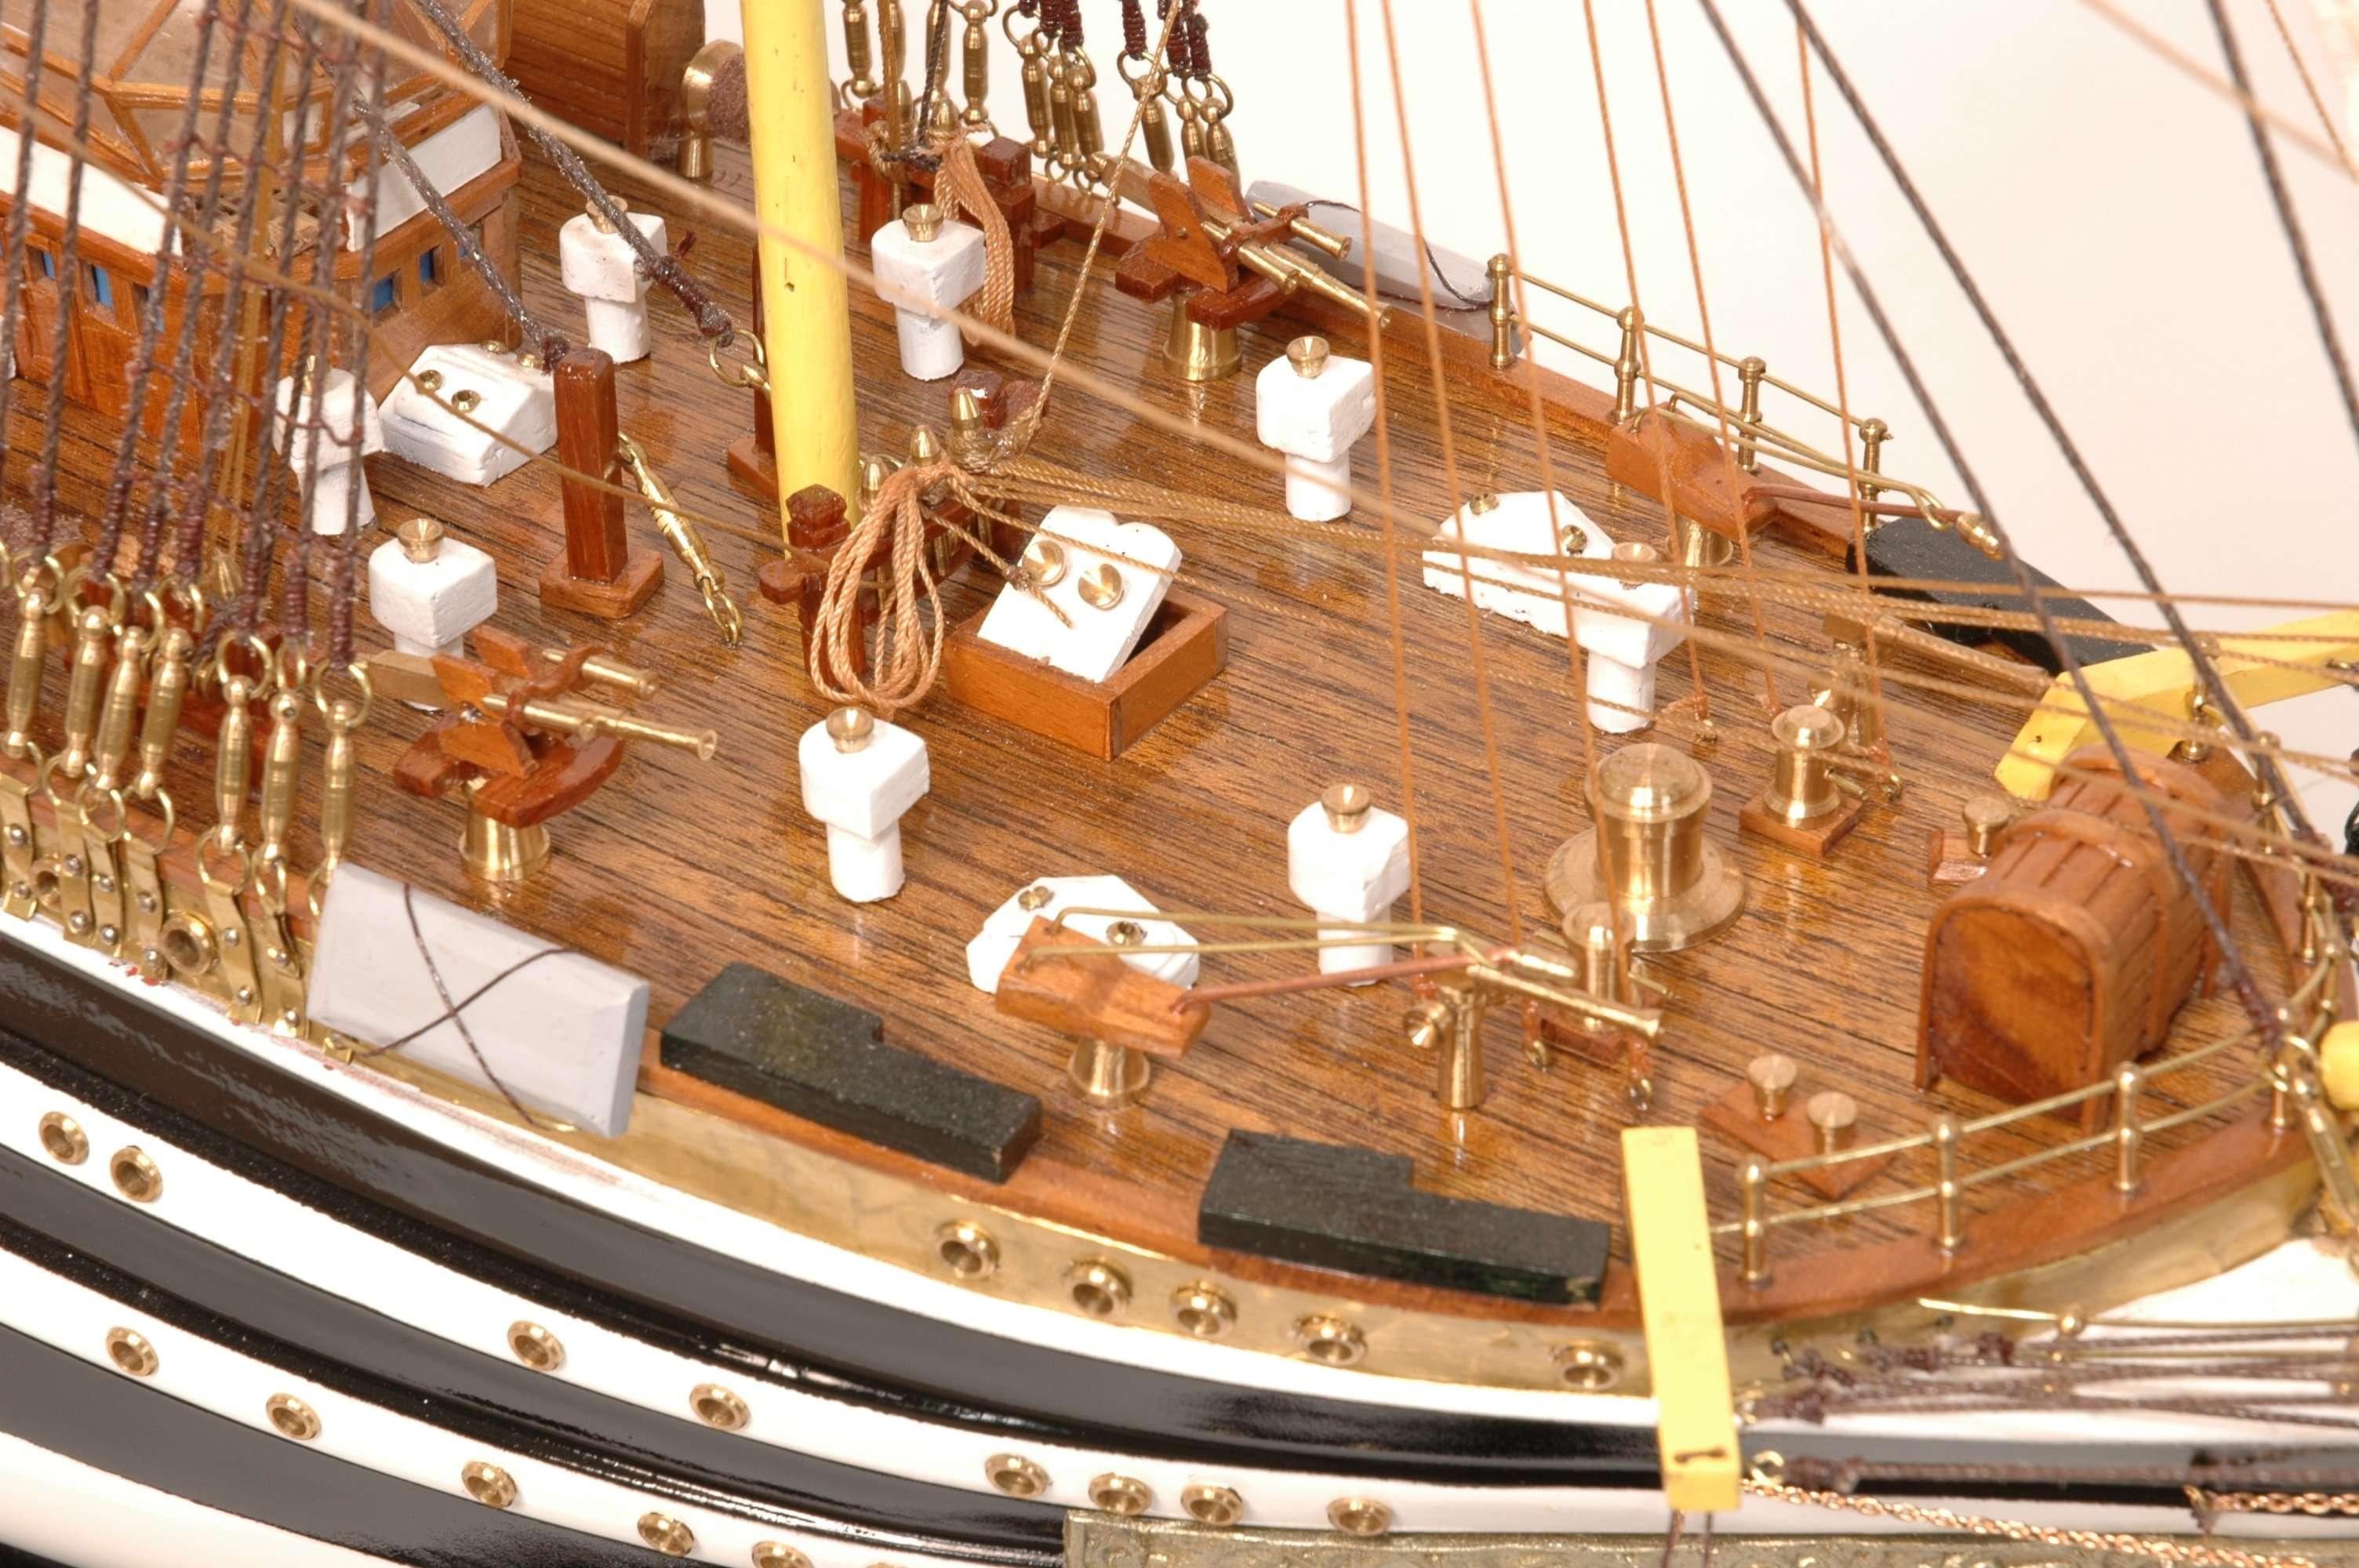 498-4214-Amerigo-Vespucci-Model-Ship-Superior-Range